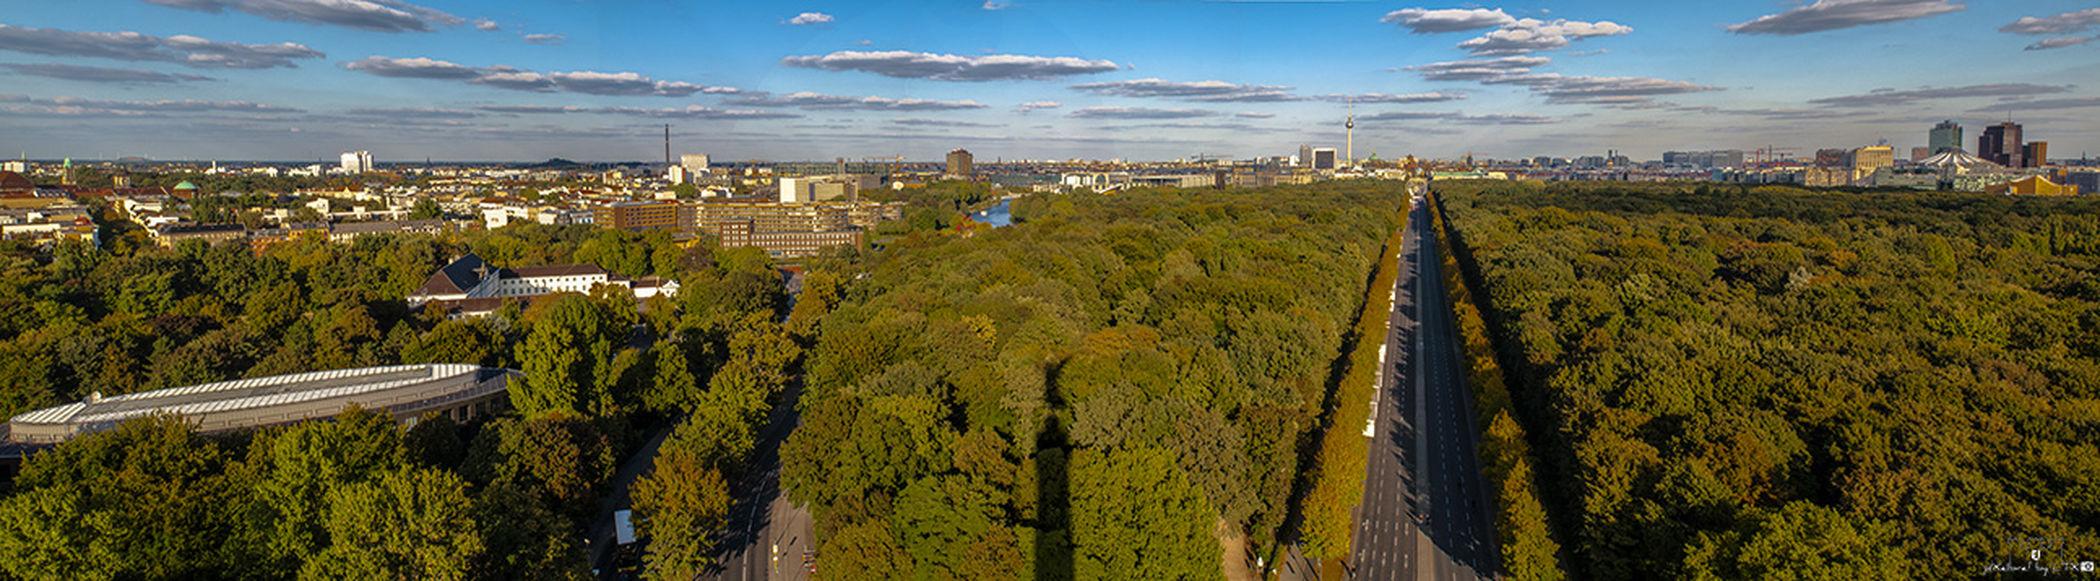 Im Rücken der Goldelse Berlin Daylight Clouds And Sky Enjoying The View Tiergarten Panorama Berliner Ansichten Großer Stern Straße Des 17. Juni Shadow